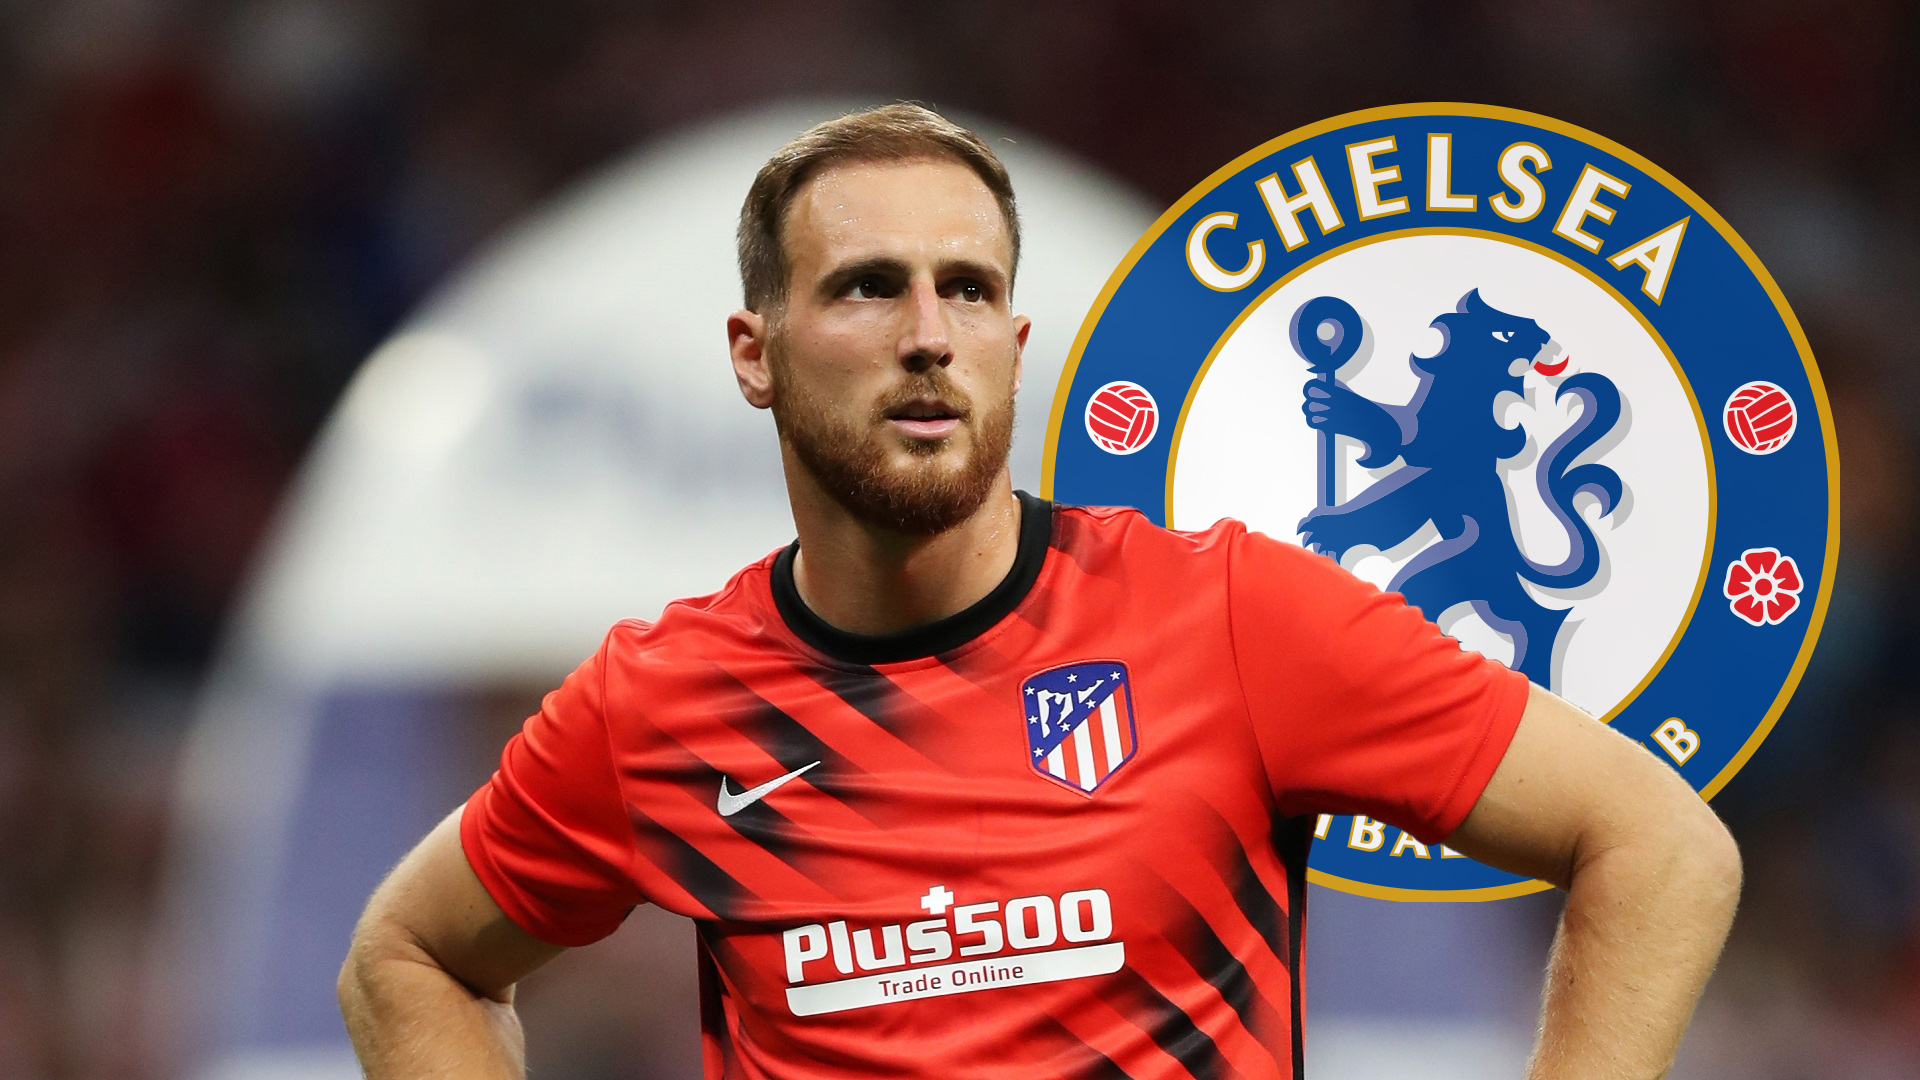 Chelsea để mắt tới Jan Oblak của Atletico Madrid? - Bóng Đá